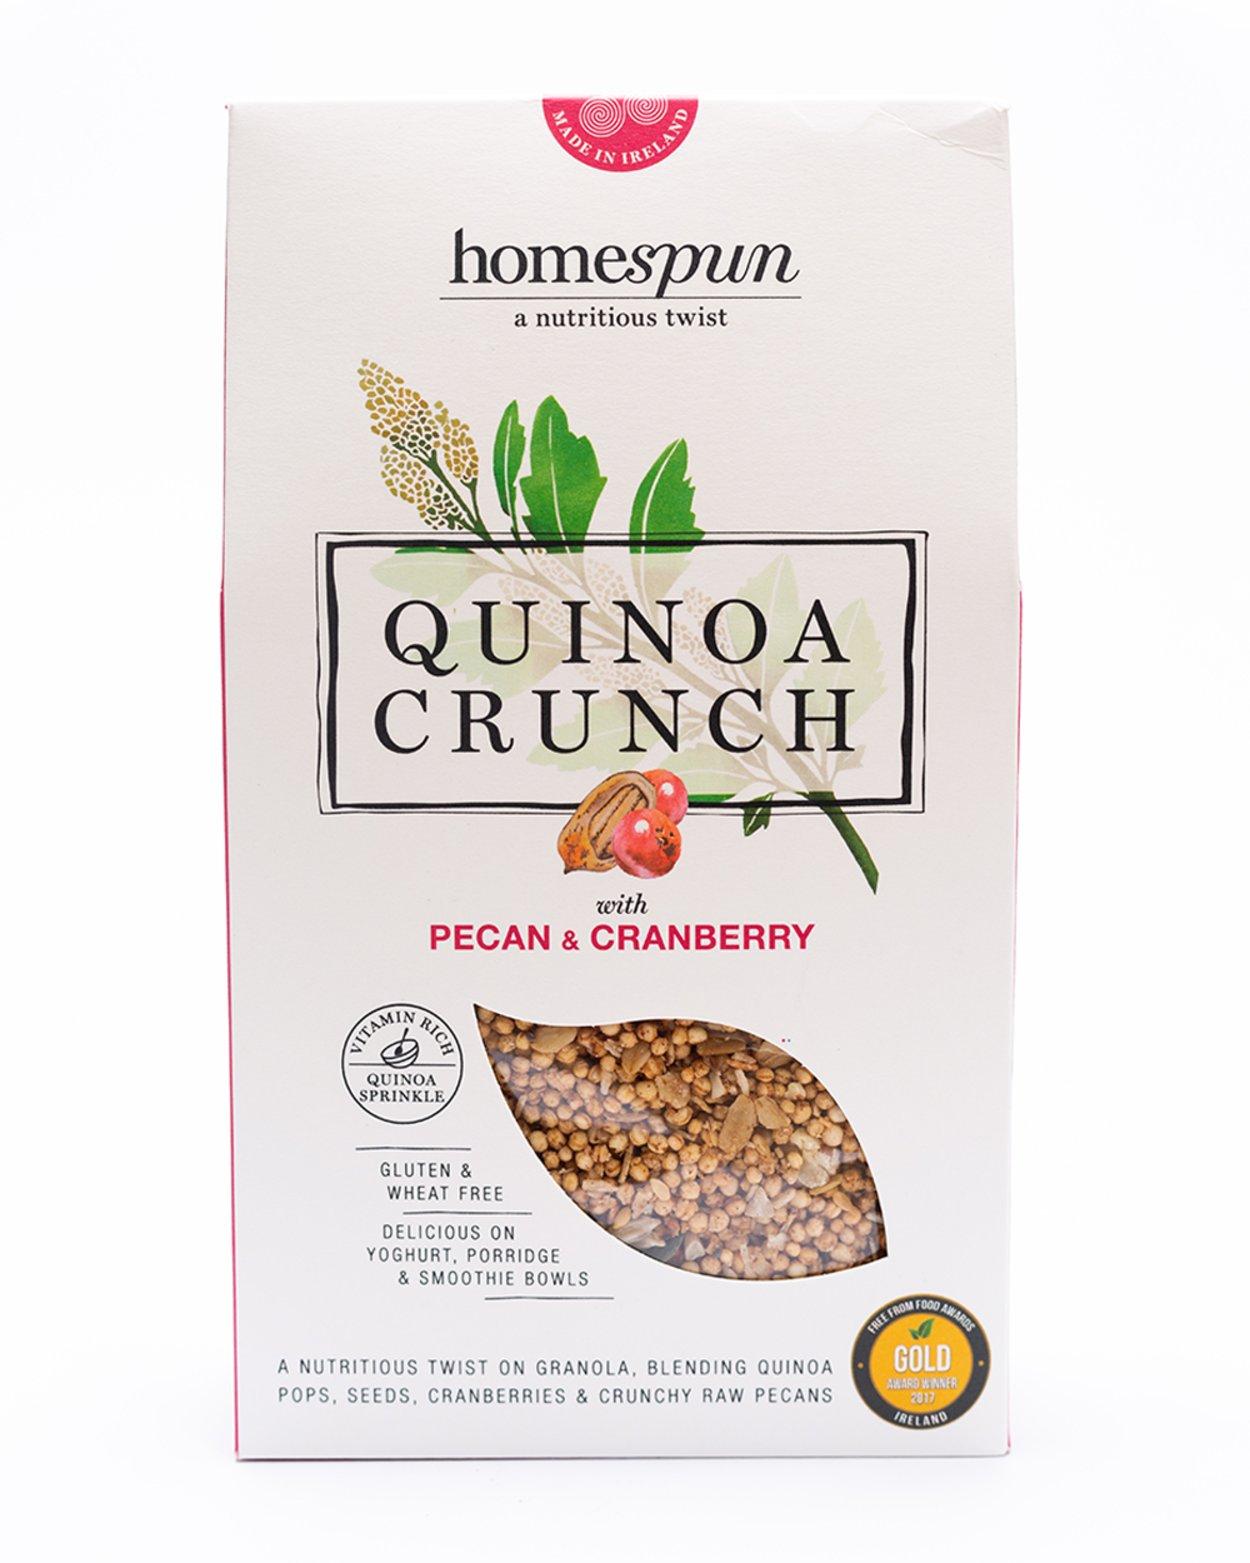 Homespun Pecan & Cranberry Quinoa Crunch